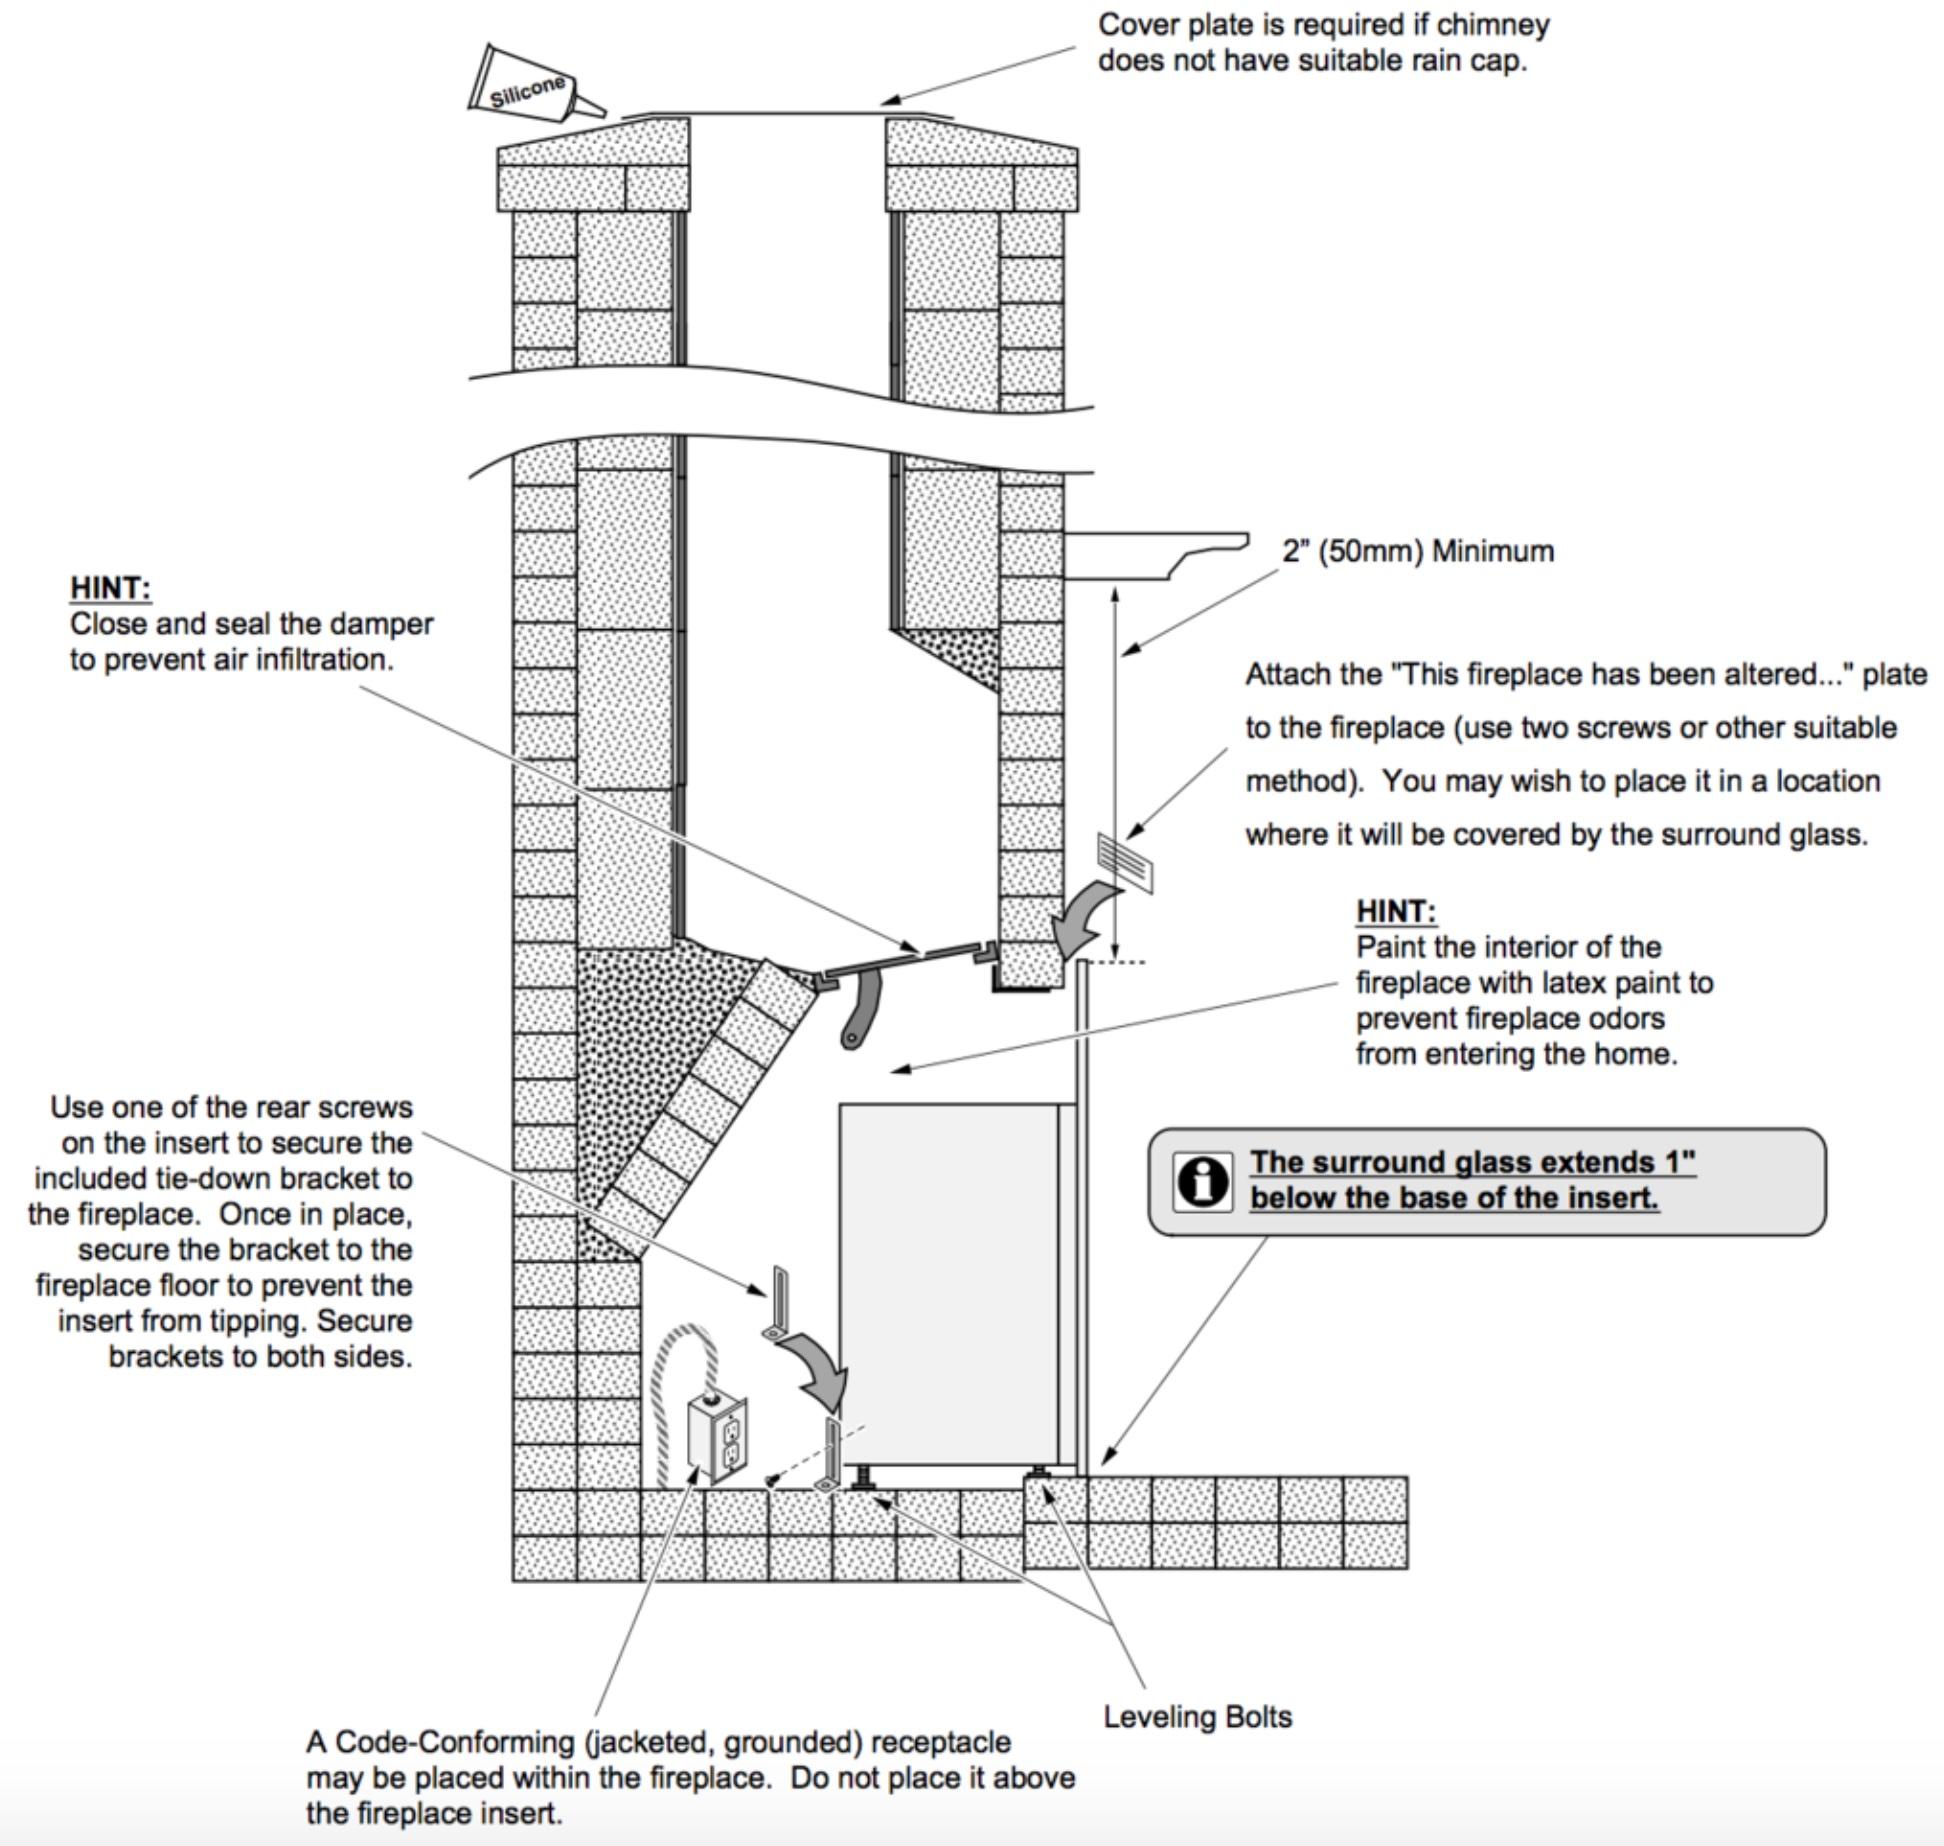 hight resolution of installation diagram courtesy modernblaze com jpeg